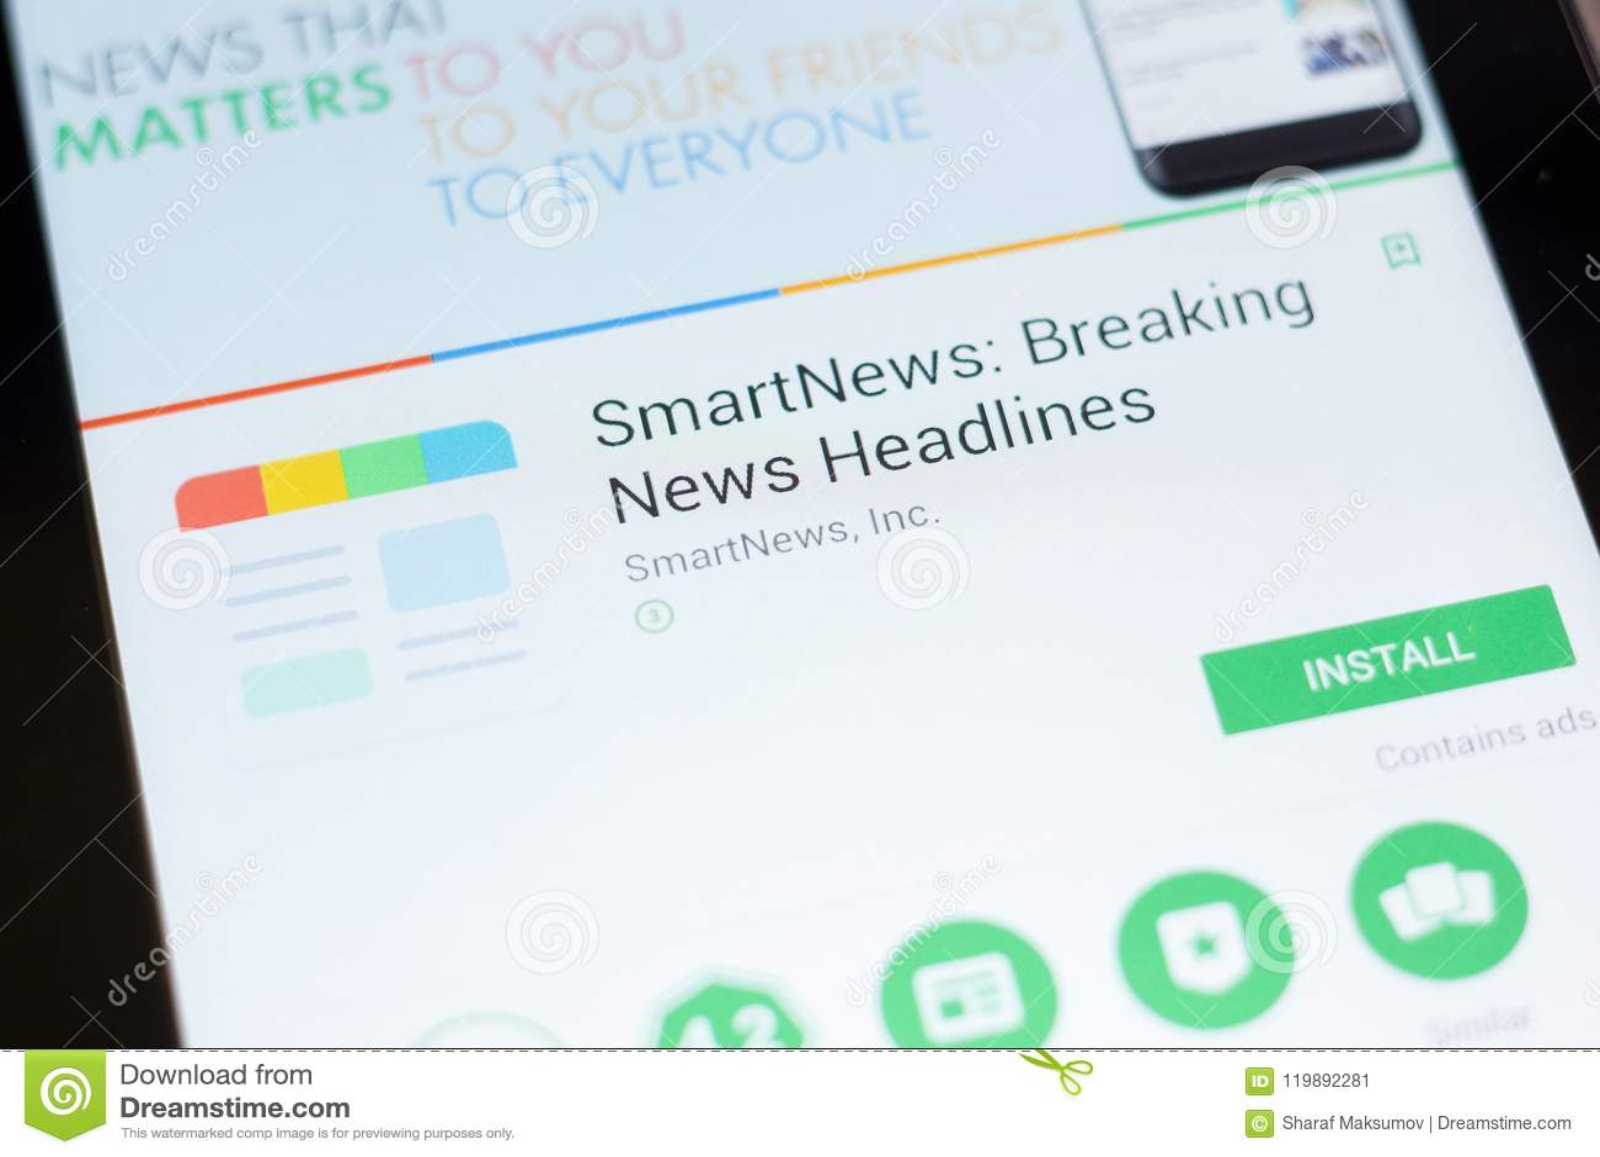 Ryazan, Russia - June 24, 2018: SmartNews - Breaking News